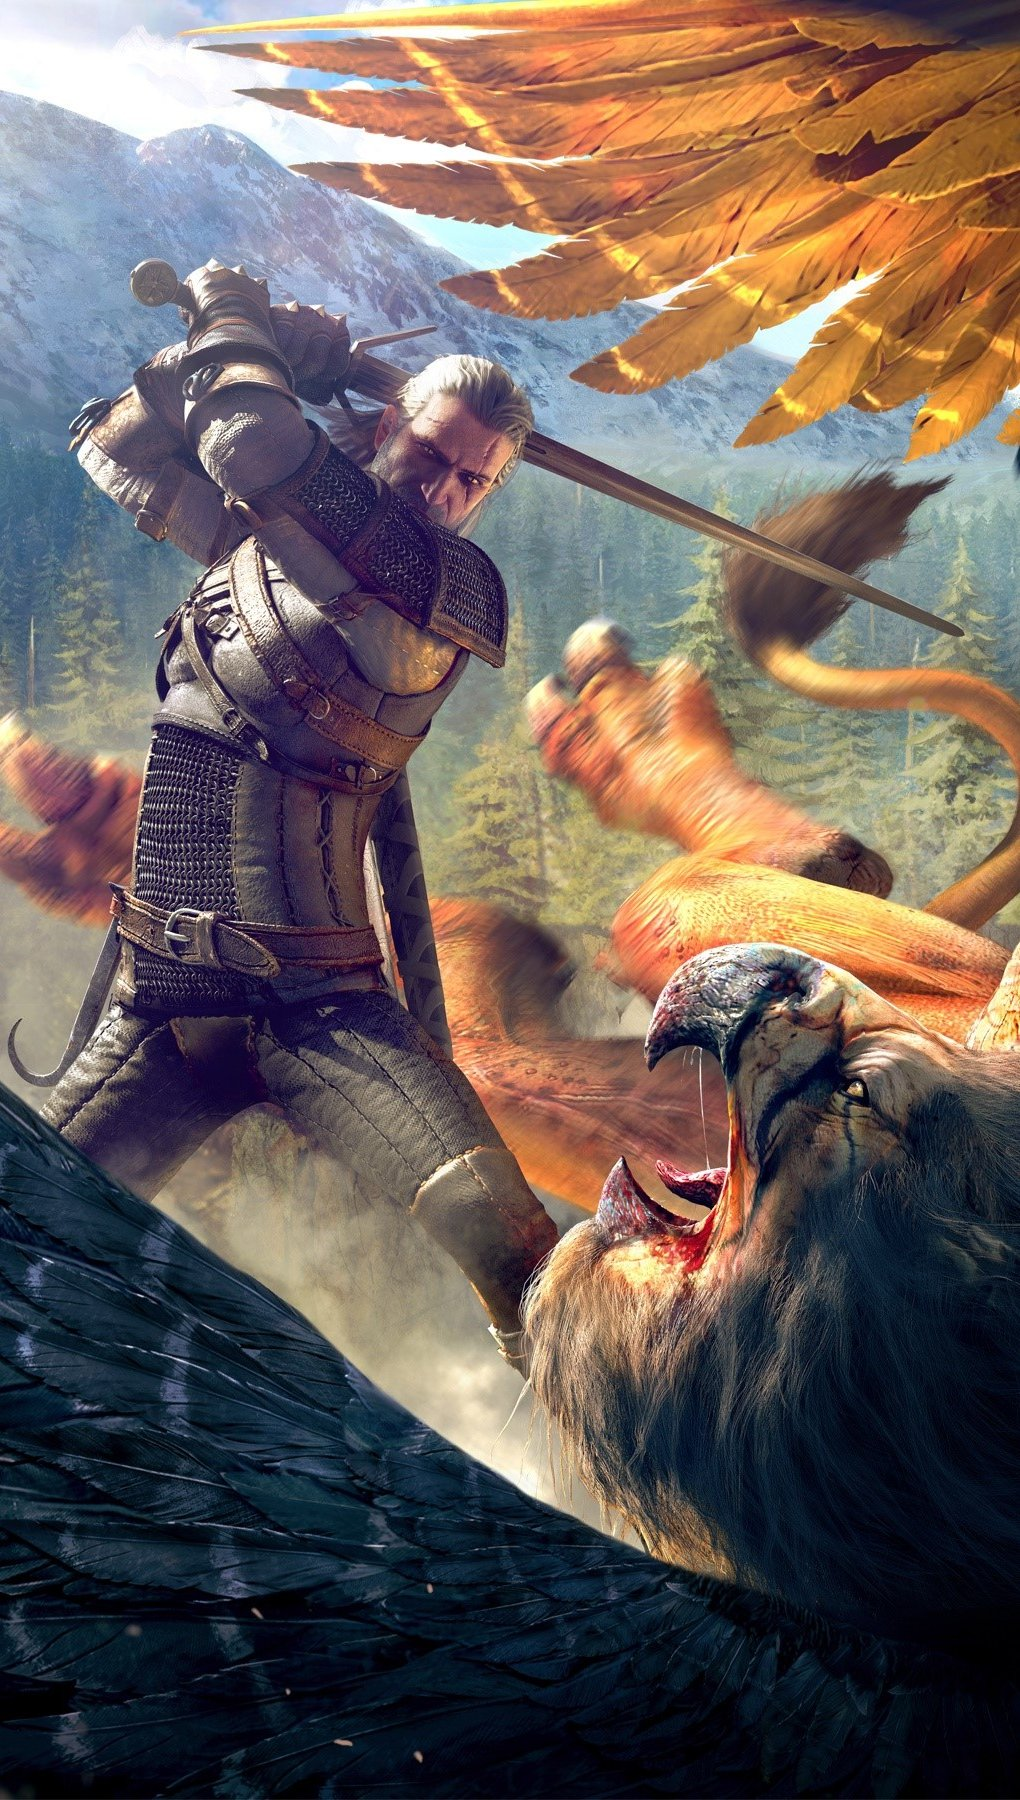 Wallpaper Gameplay of The Witcher 3 Wild Hunt Vertical